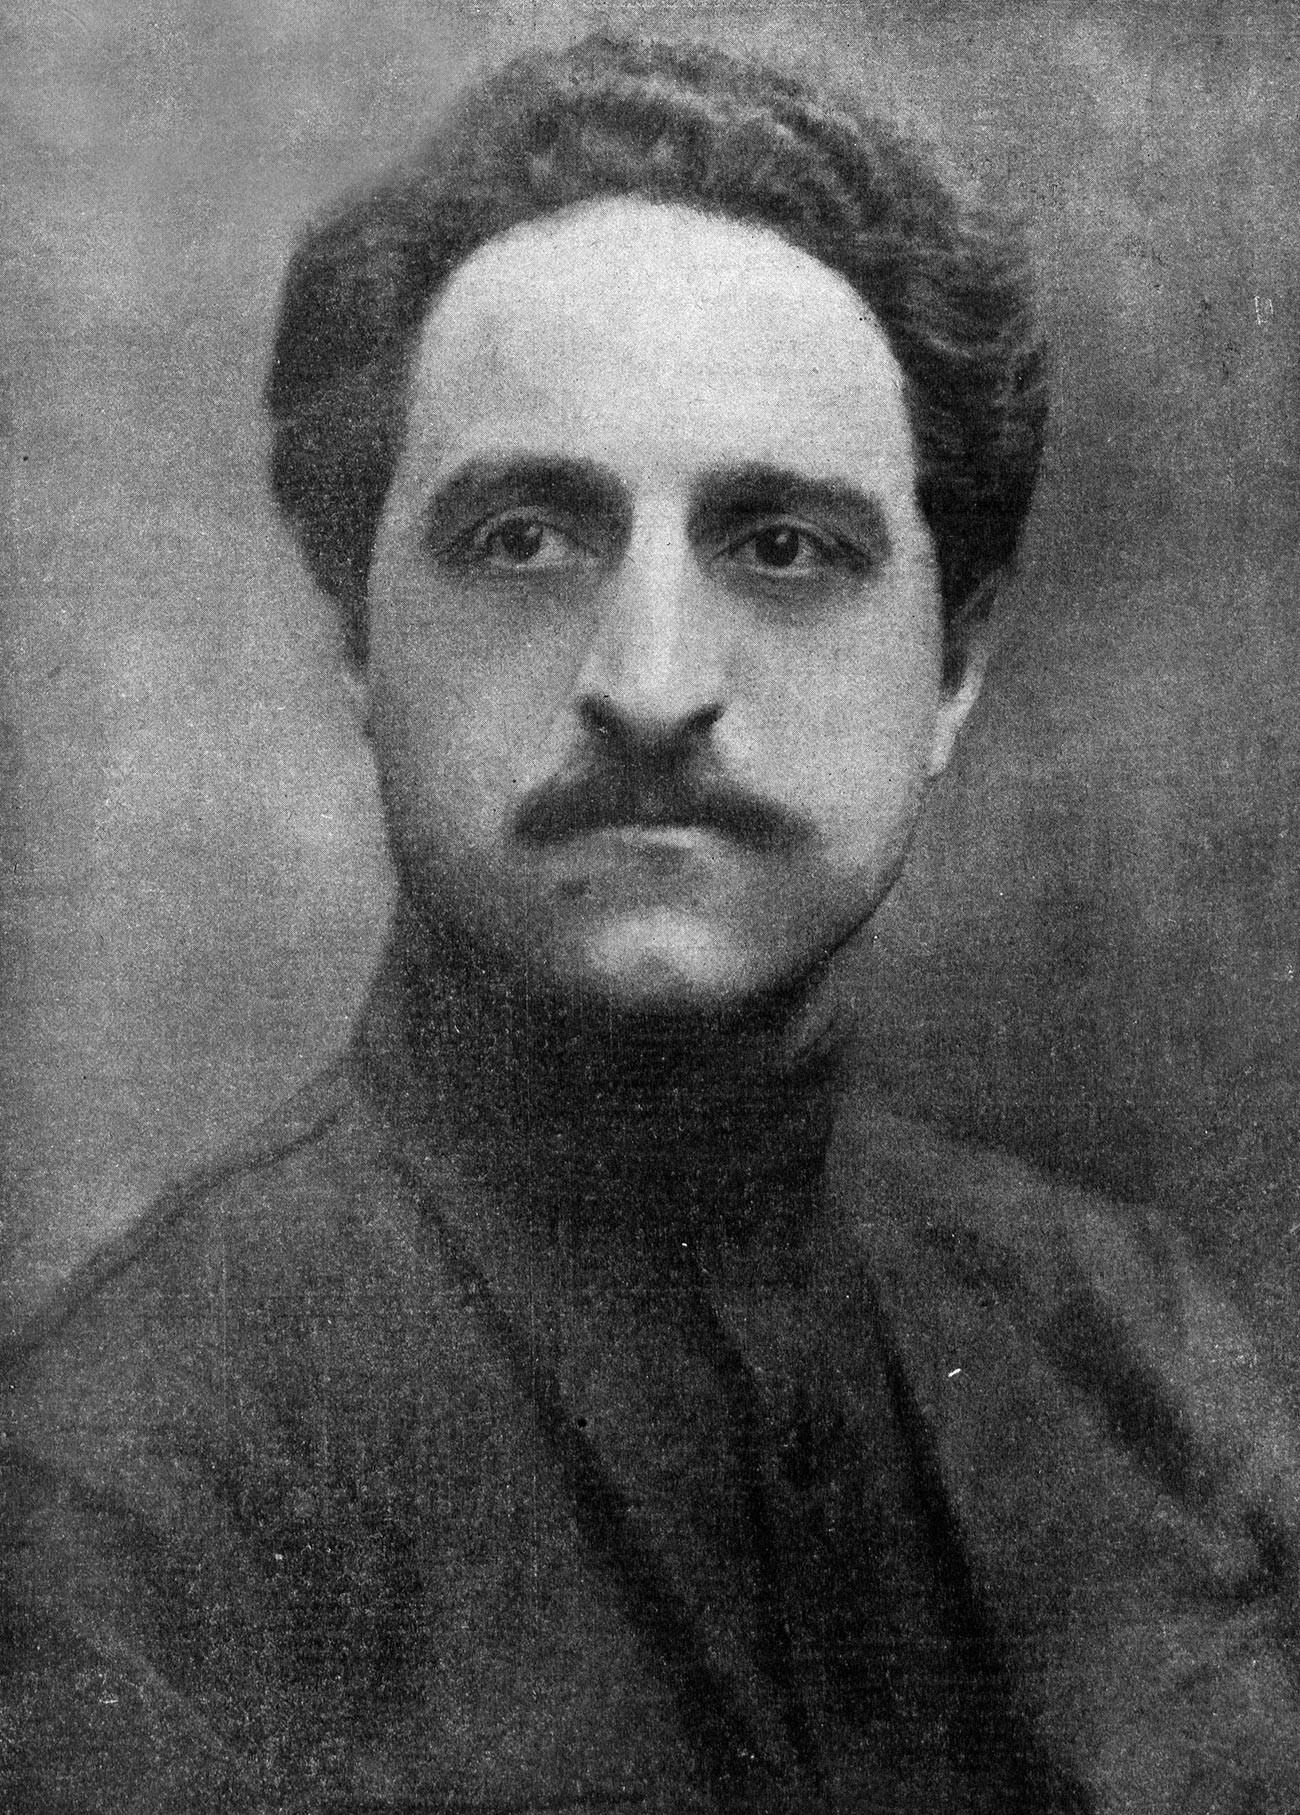 Sergo Ordzhónikidze